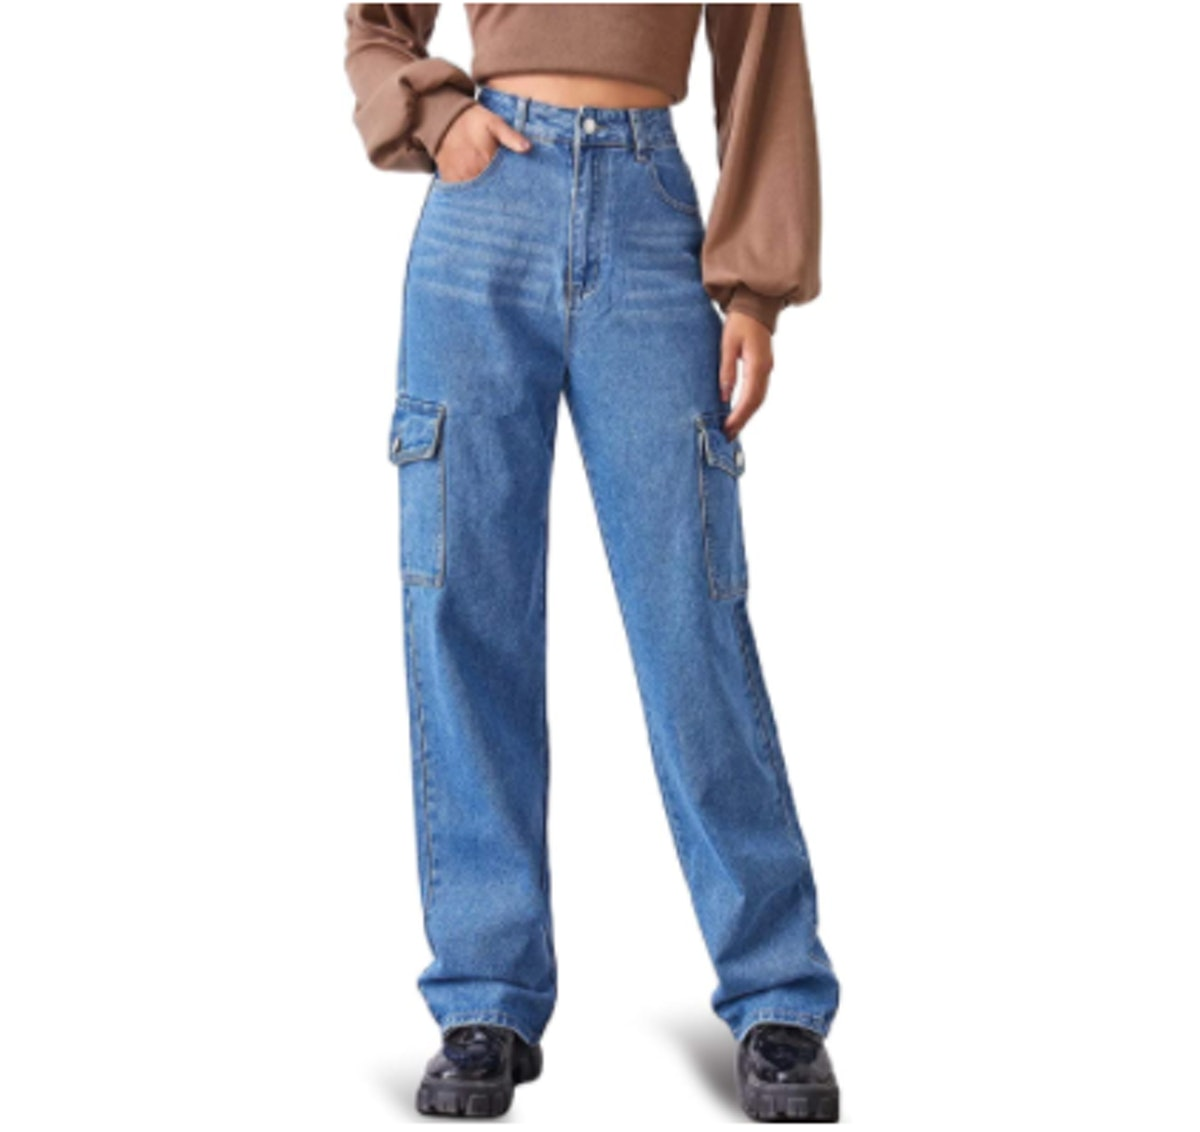 MUMUBREAL High Waist Baggy Jeans